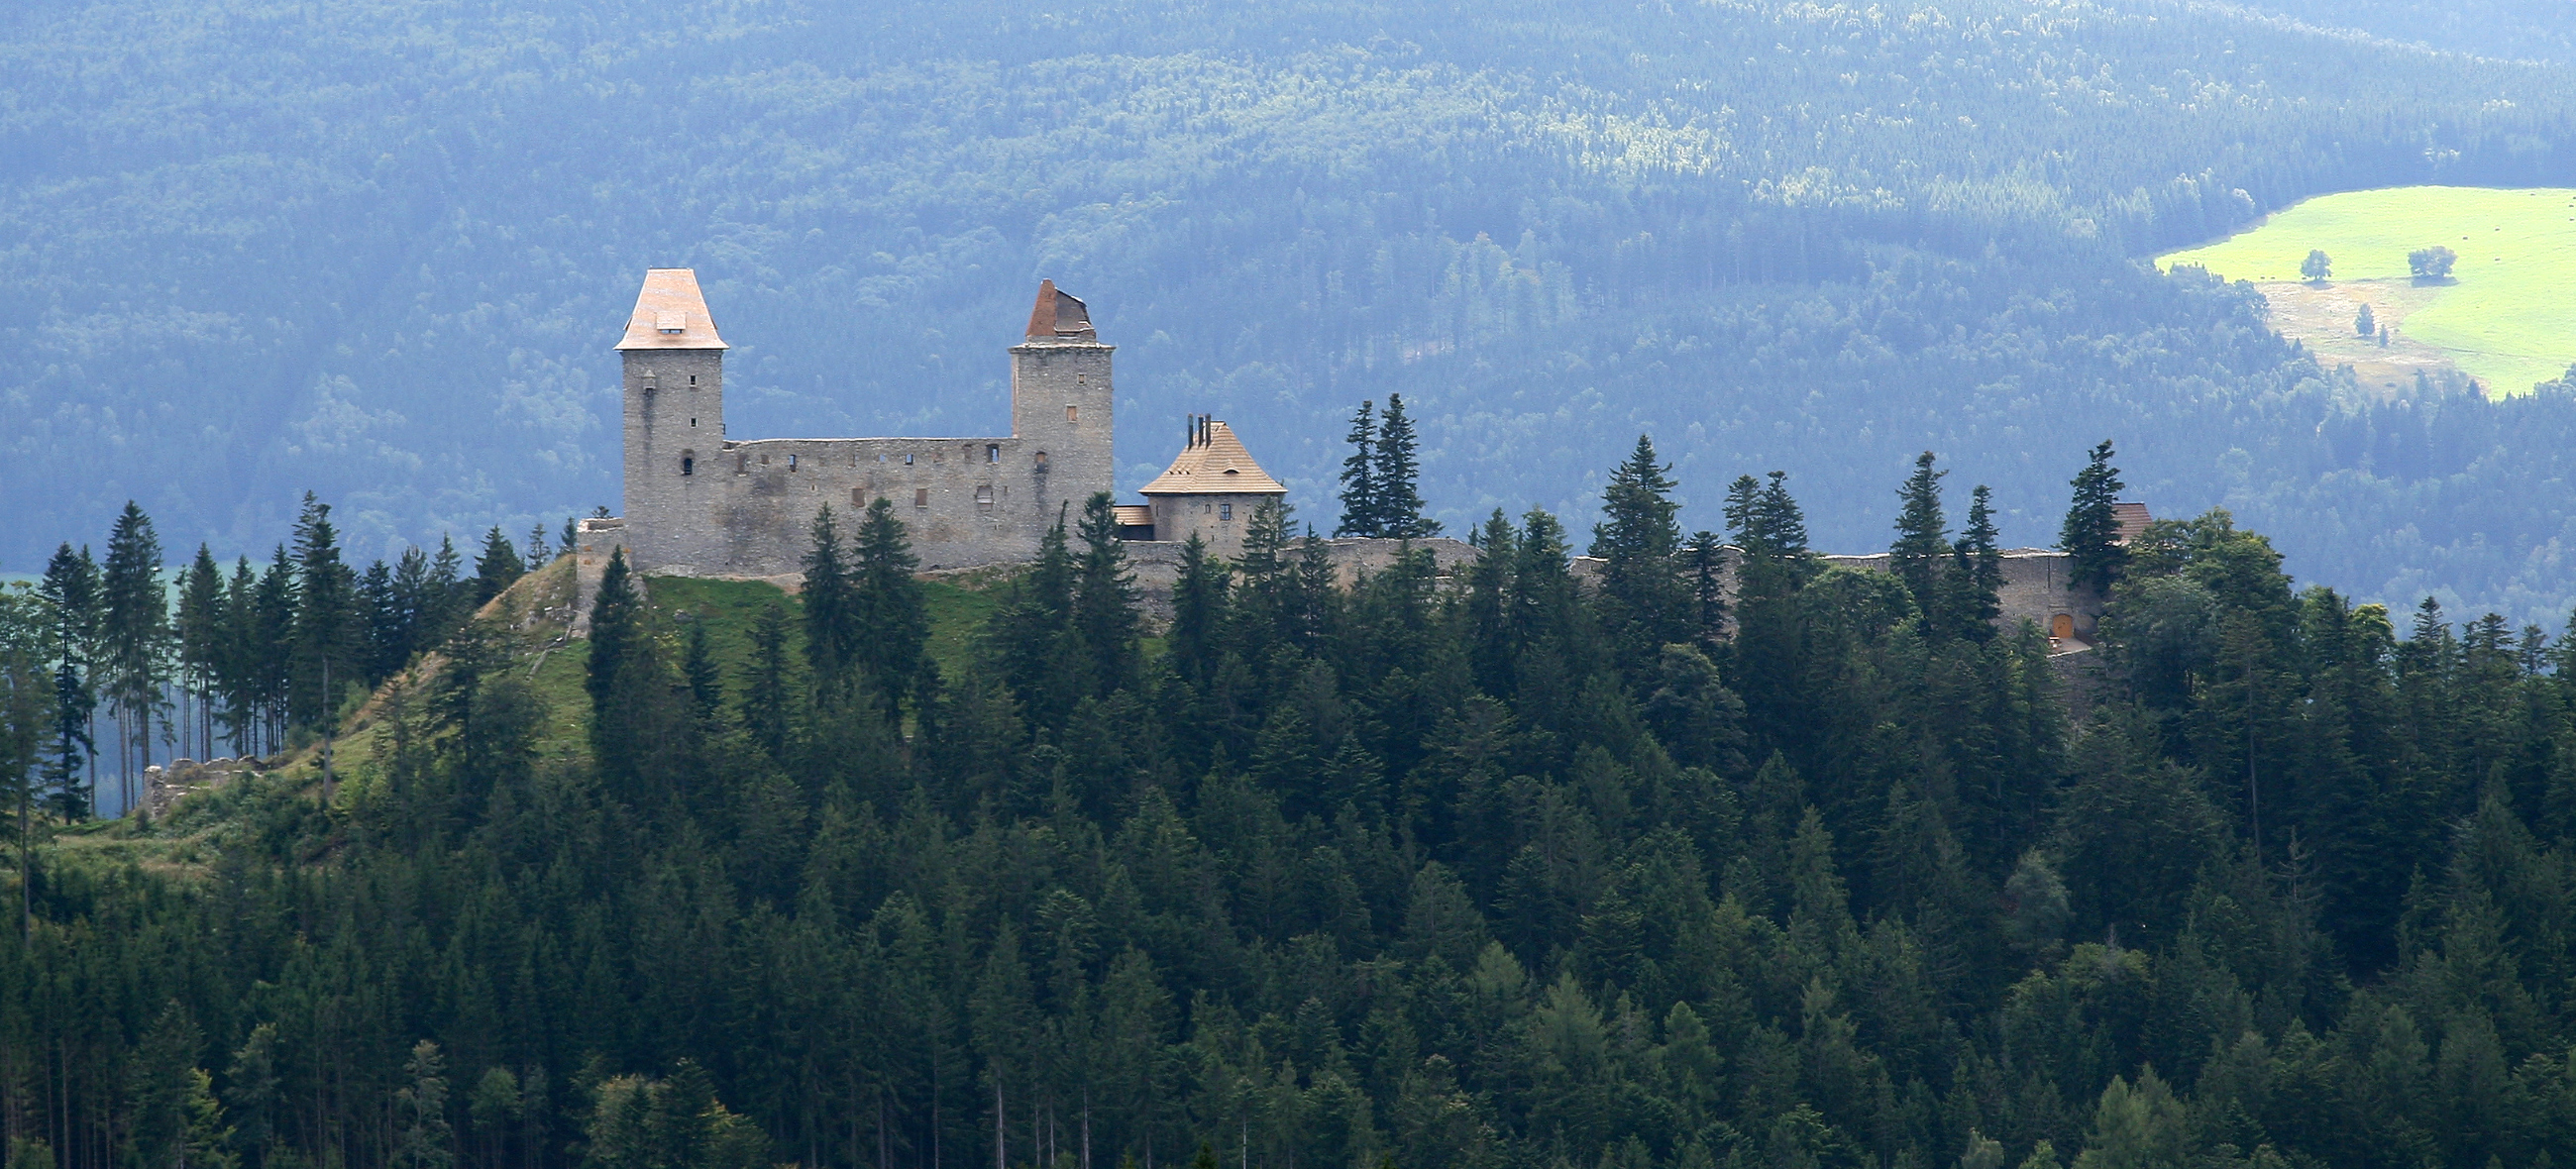 https://upload.wikimedia.org/wikipedia/commons/7/70/Severn%C3%AD_strana_hradu_Ka%C5%A1perk_p%C5%99i_pohledu_ze_Sedla.jpg